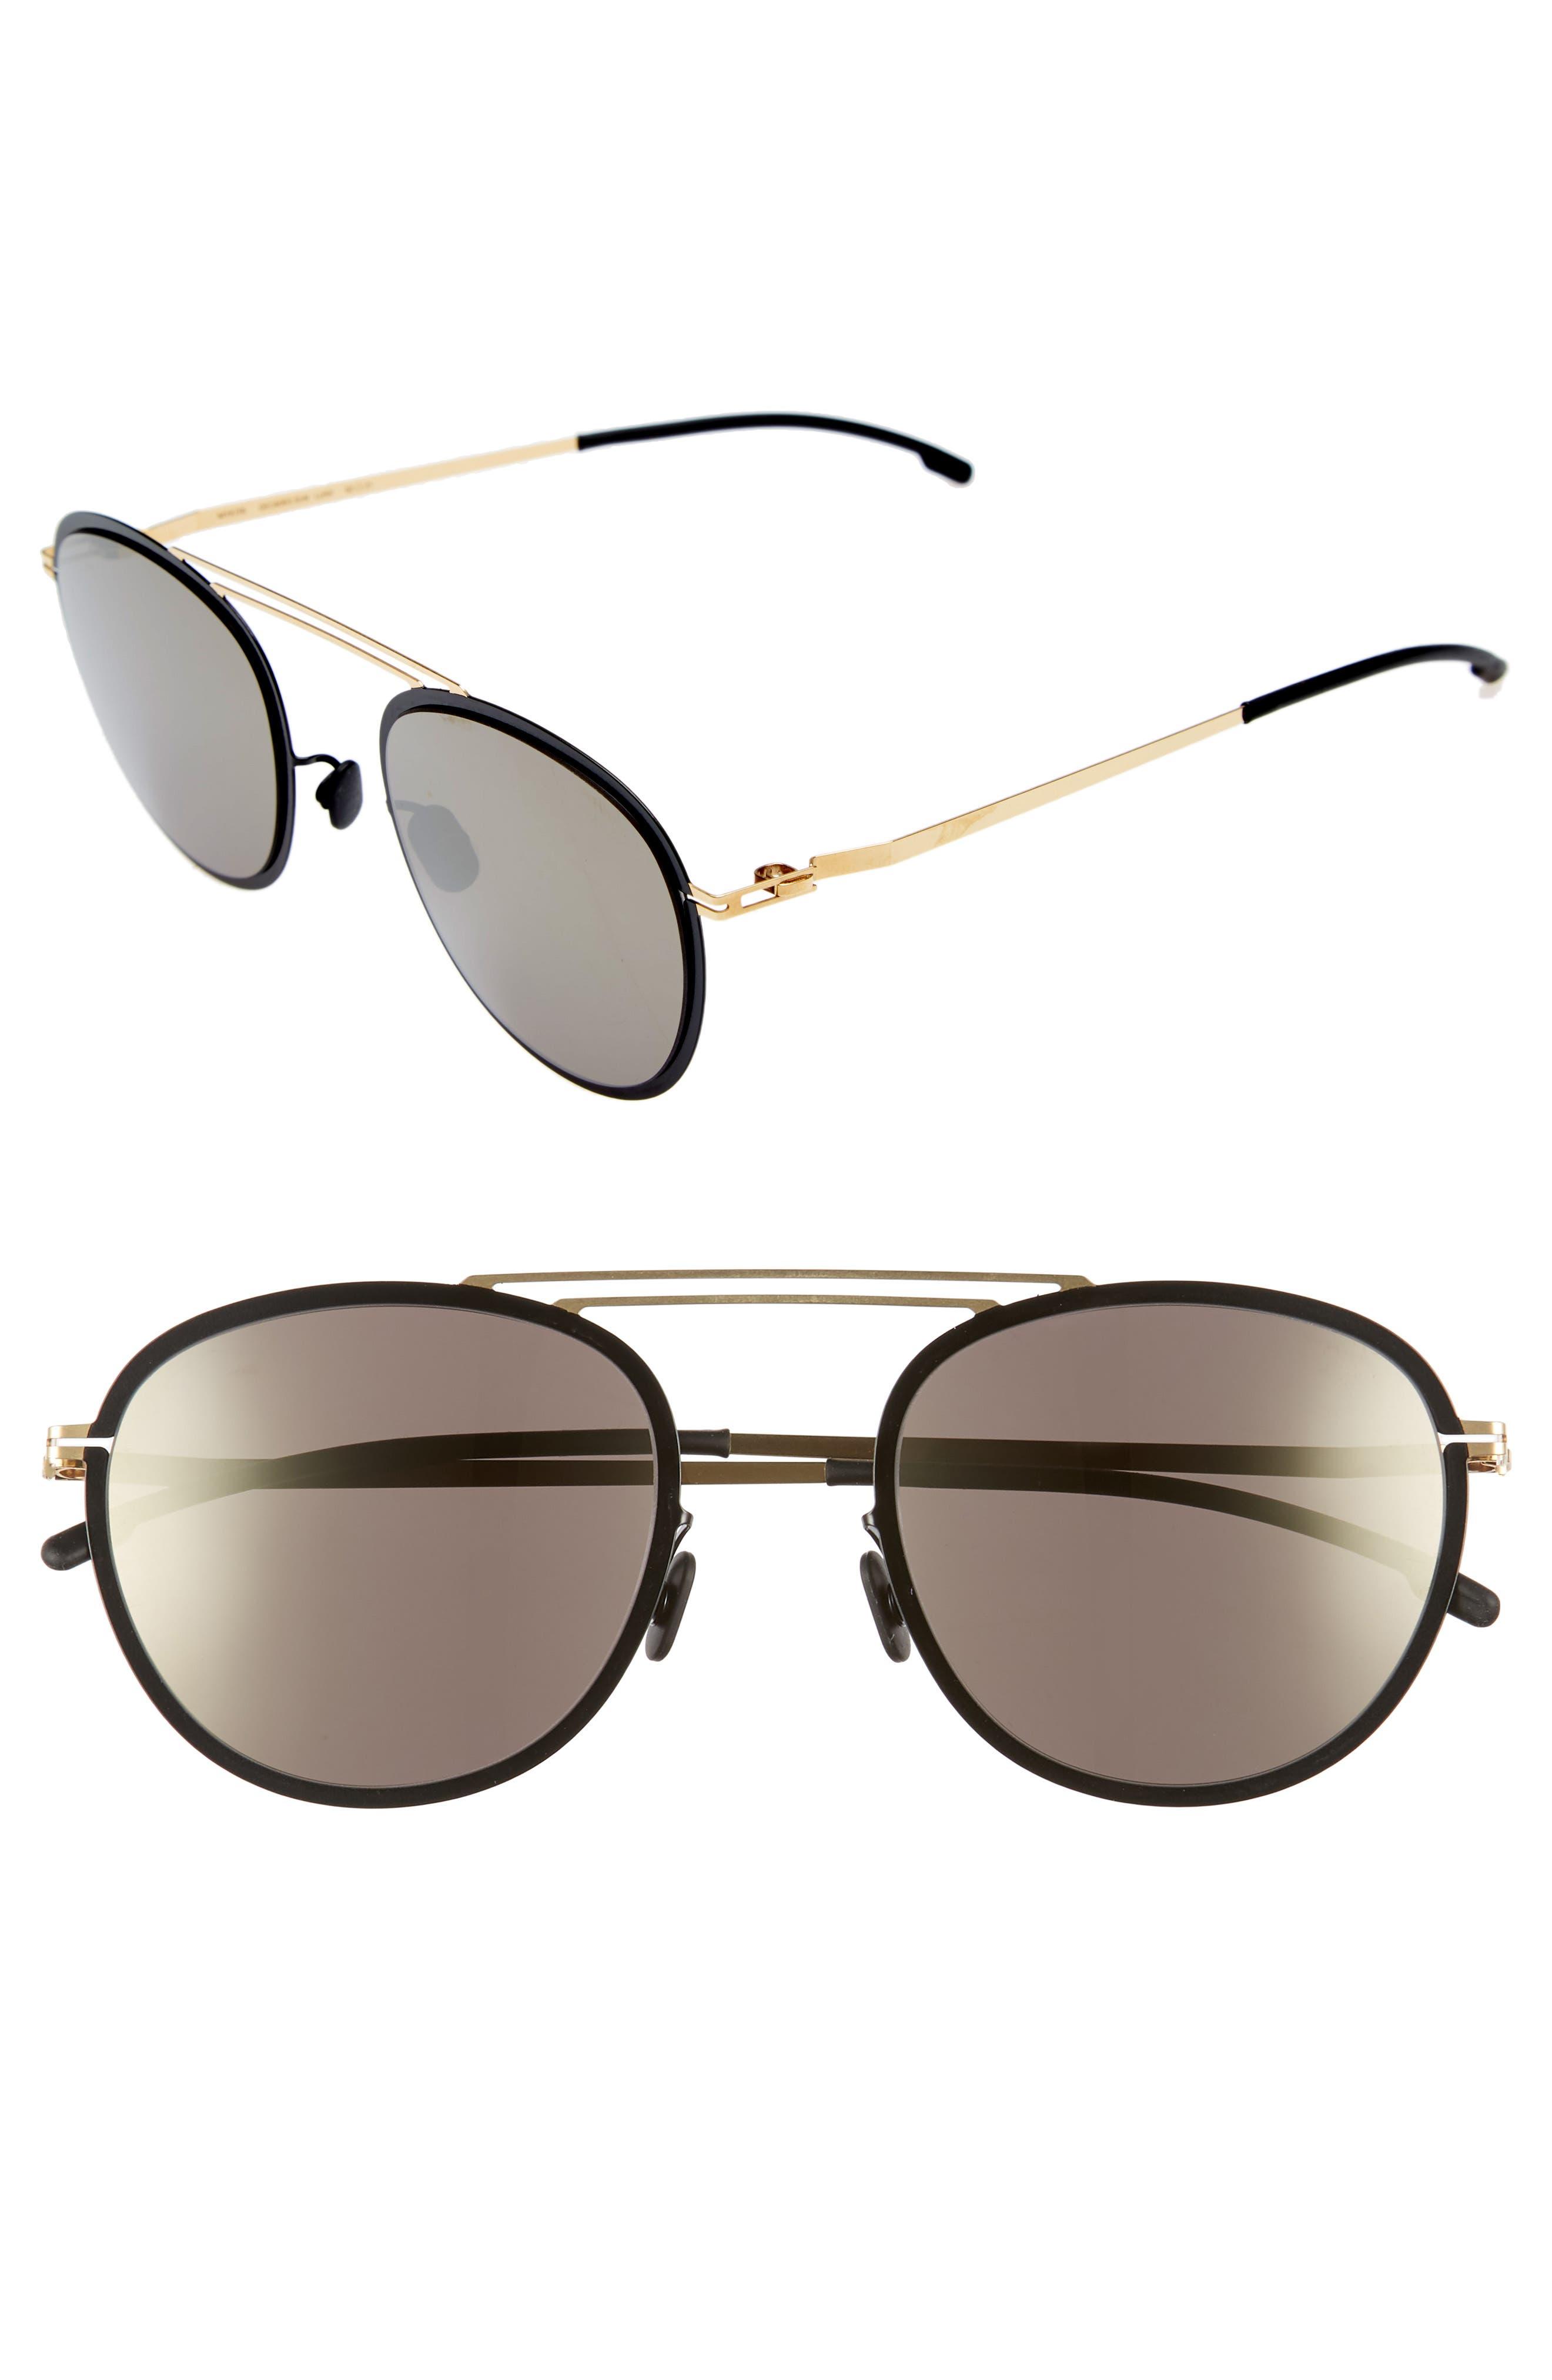 Luigi 52mm Aviator Sunglasses,                         Main,                         color,